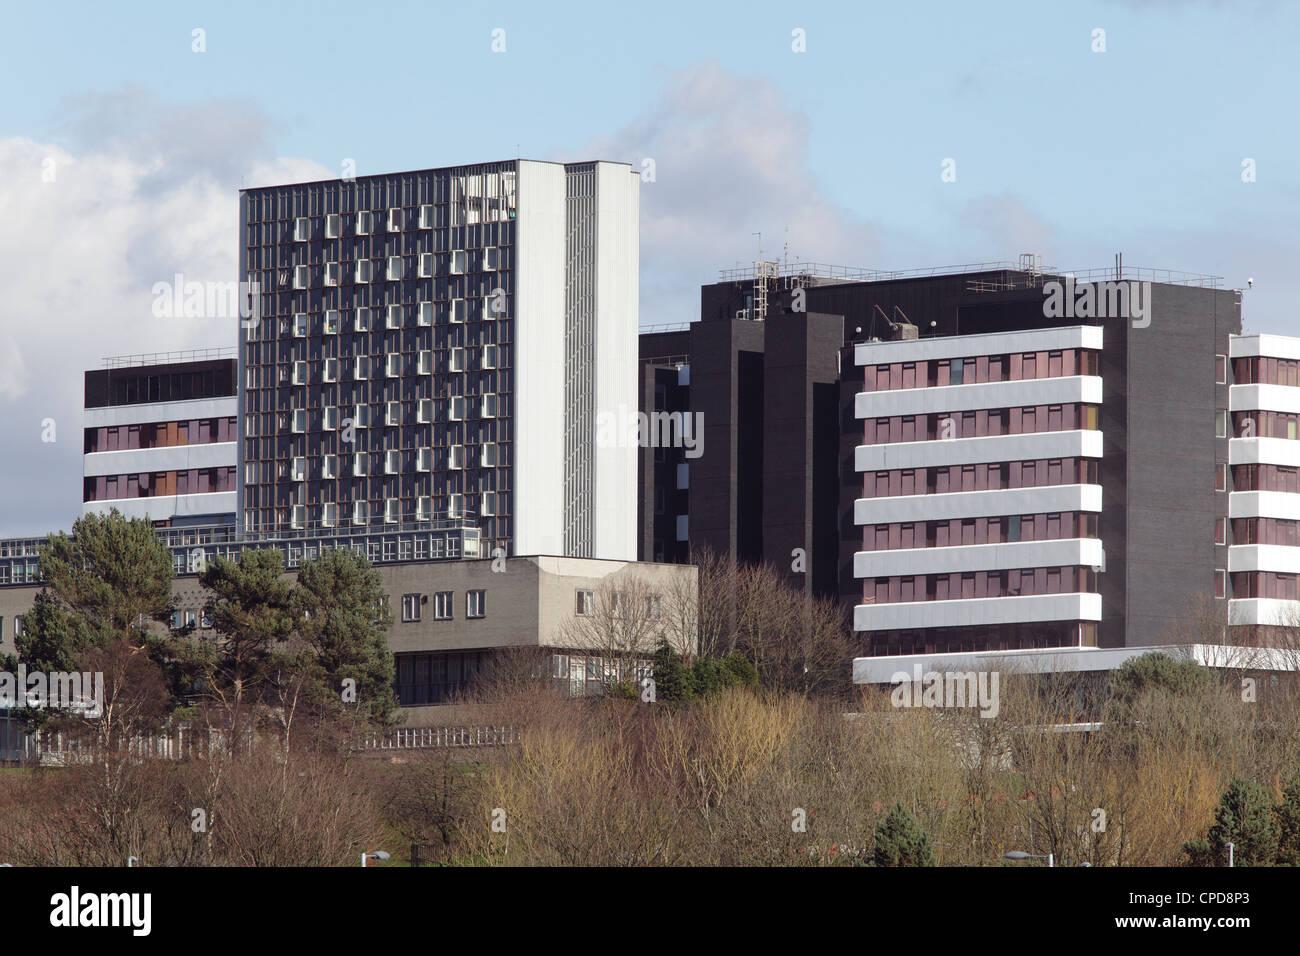 Glasgow Royal Hospital for Sick Children in Yorkhill, Glasgow, Scotland, UK - Stock Image